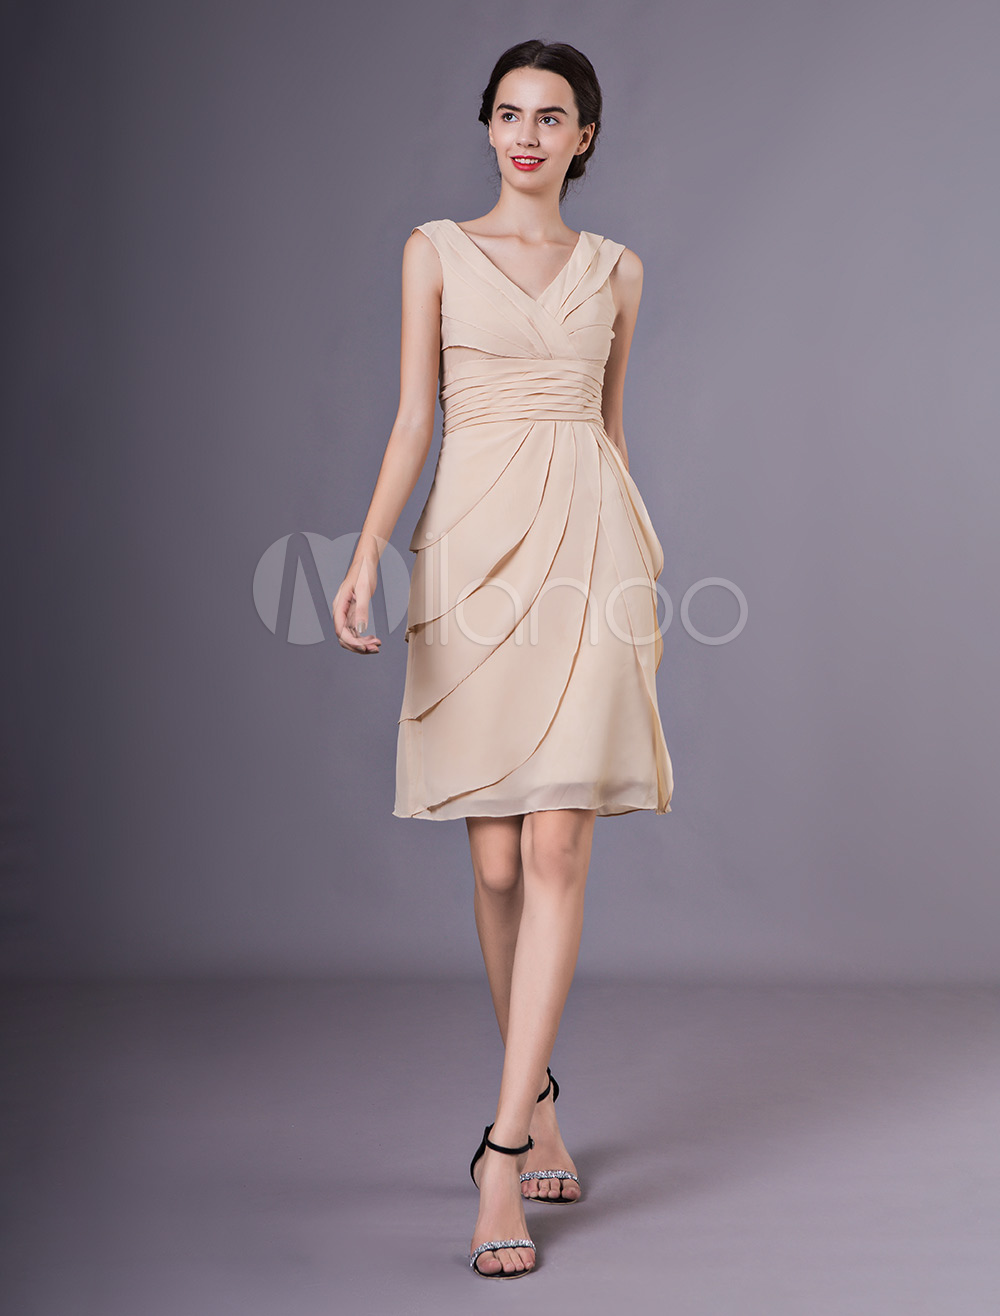 fb5ac60dd4d Wedding Guest Dresses Chiffon Short Tiered Champagne V Neck Mother Dress-No.1  ...